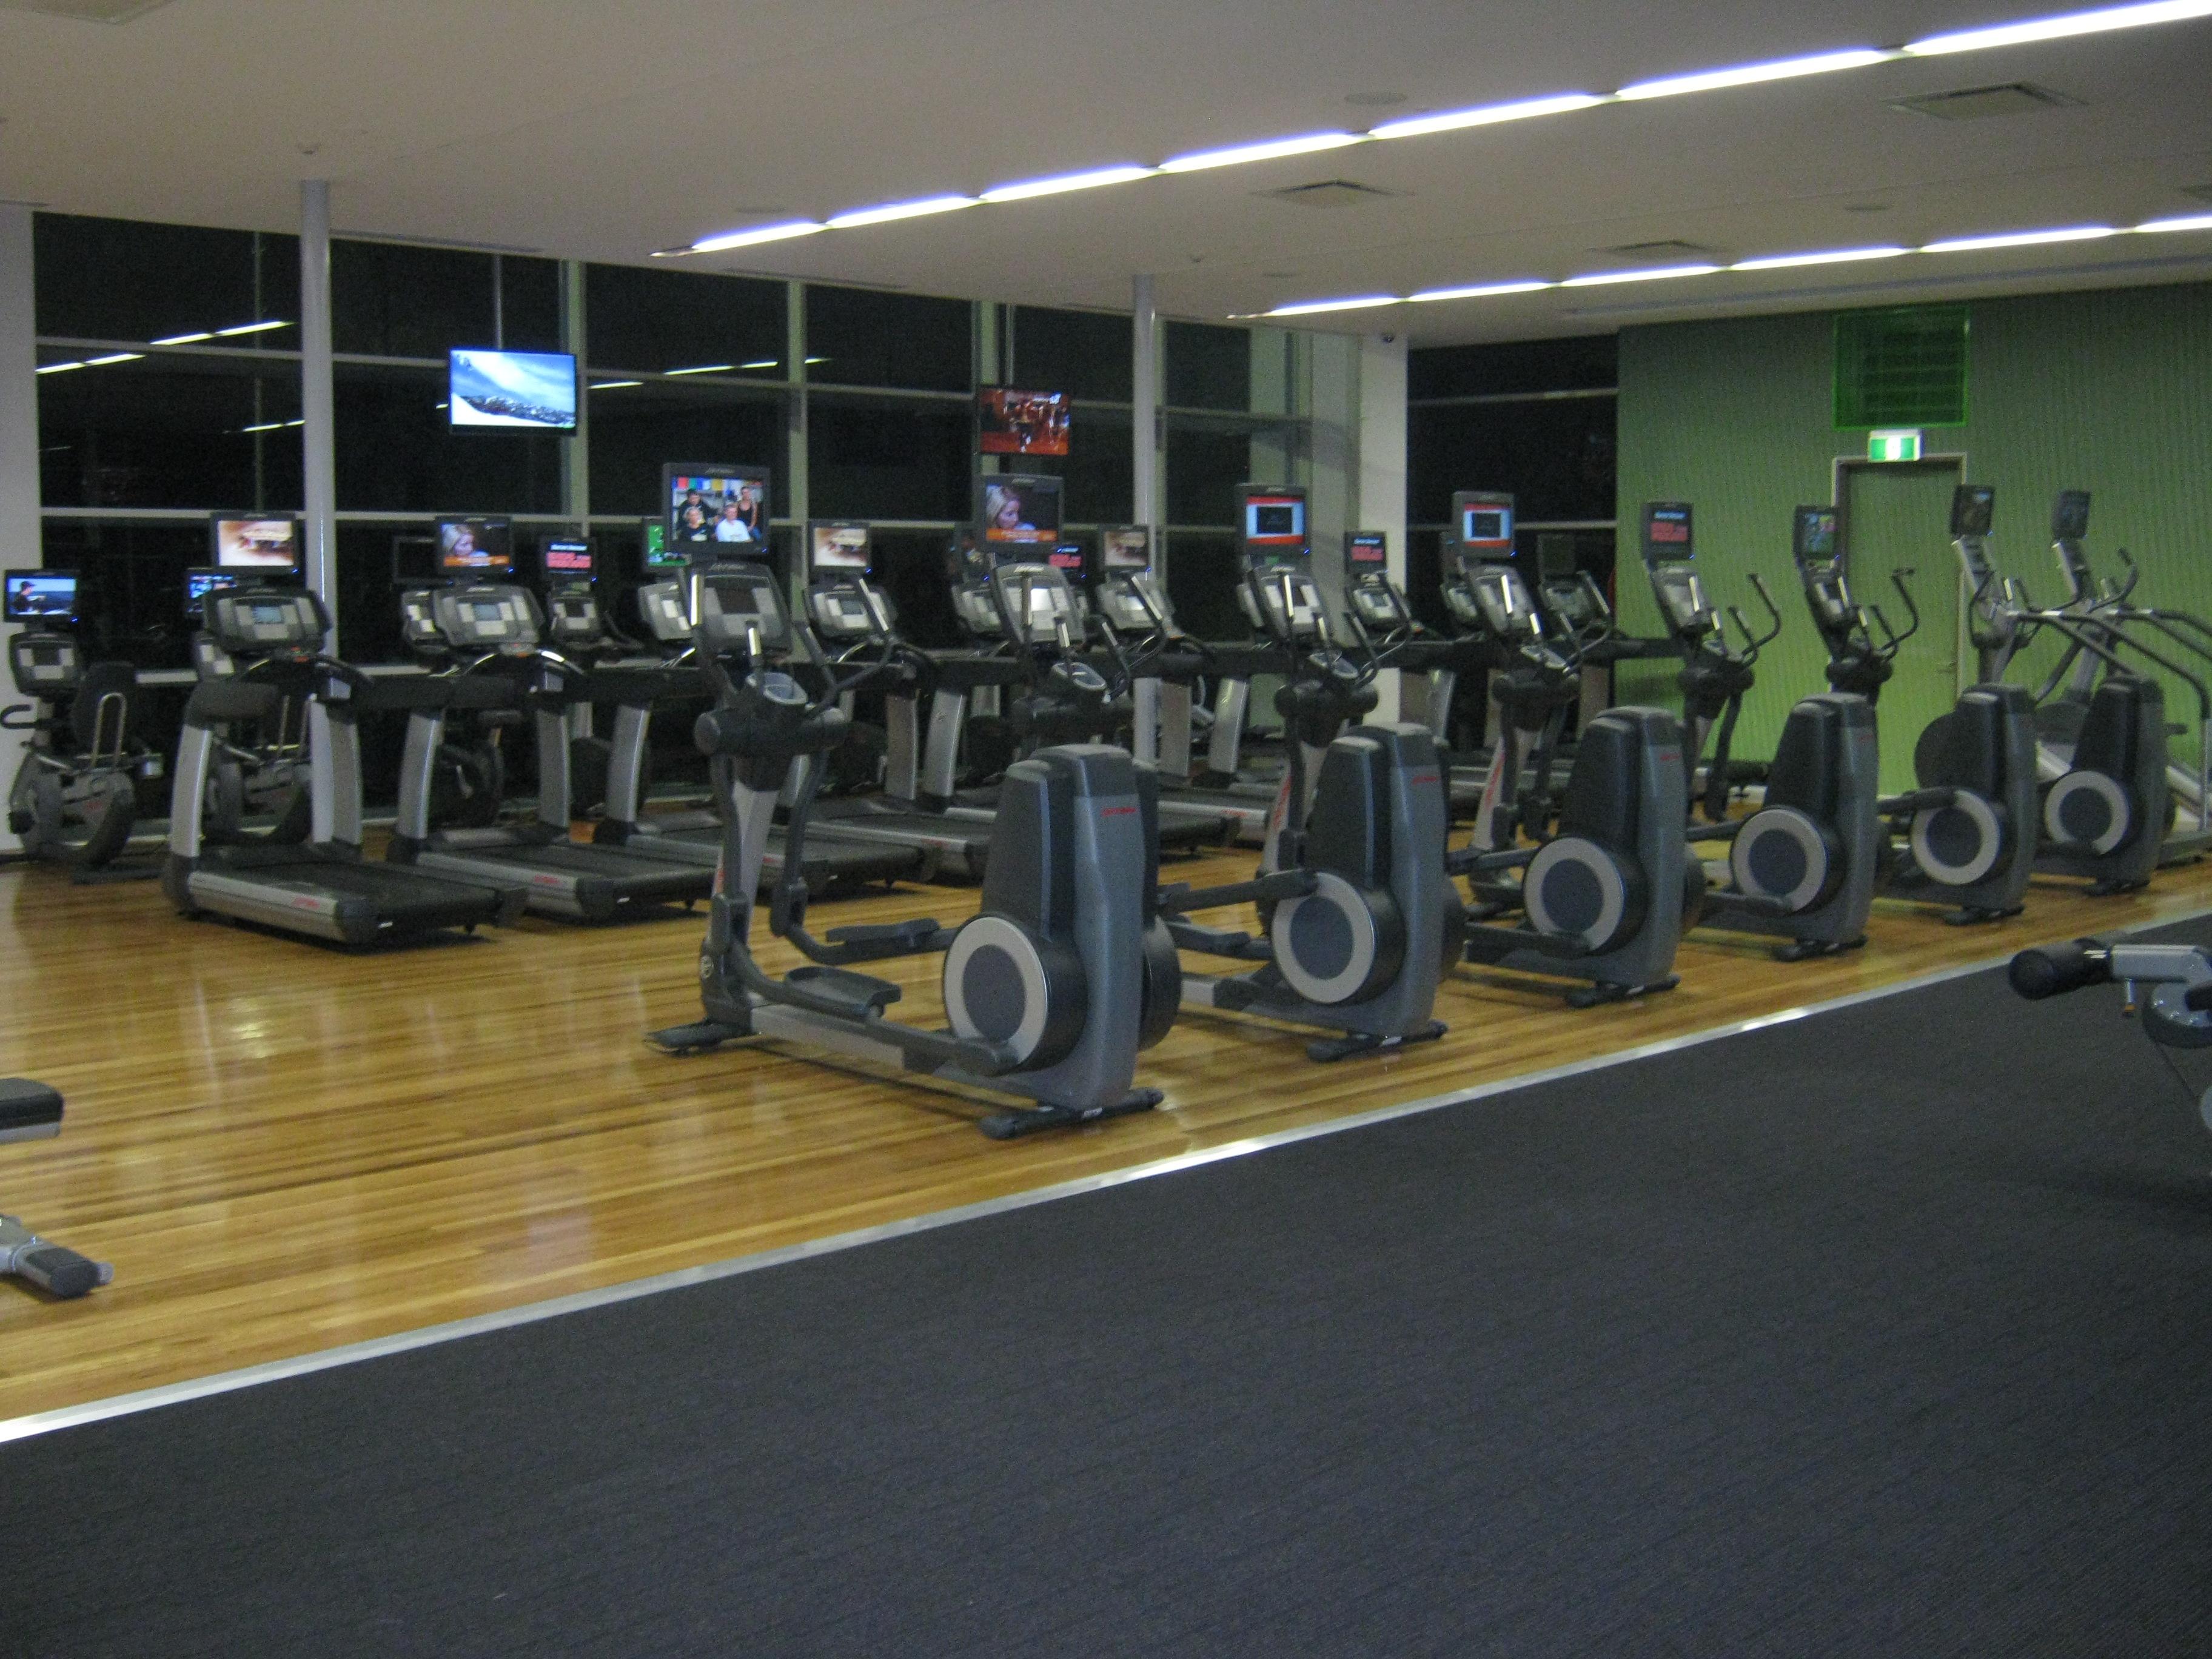 Ccsf fitness center super circuit dandk